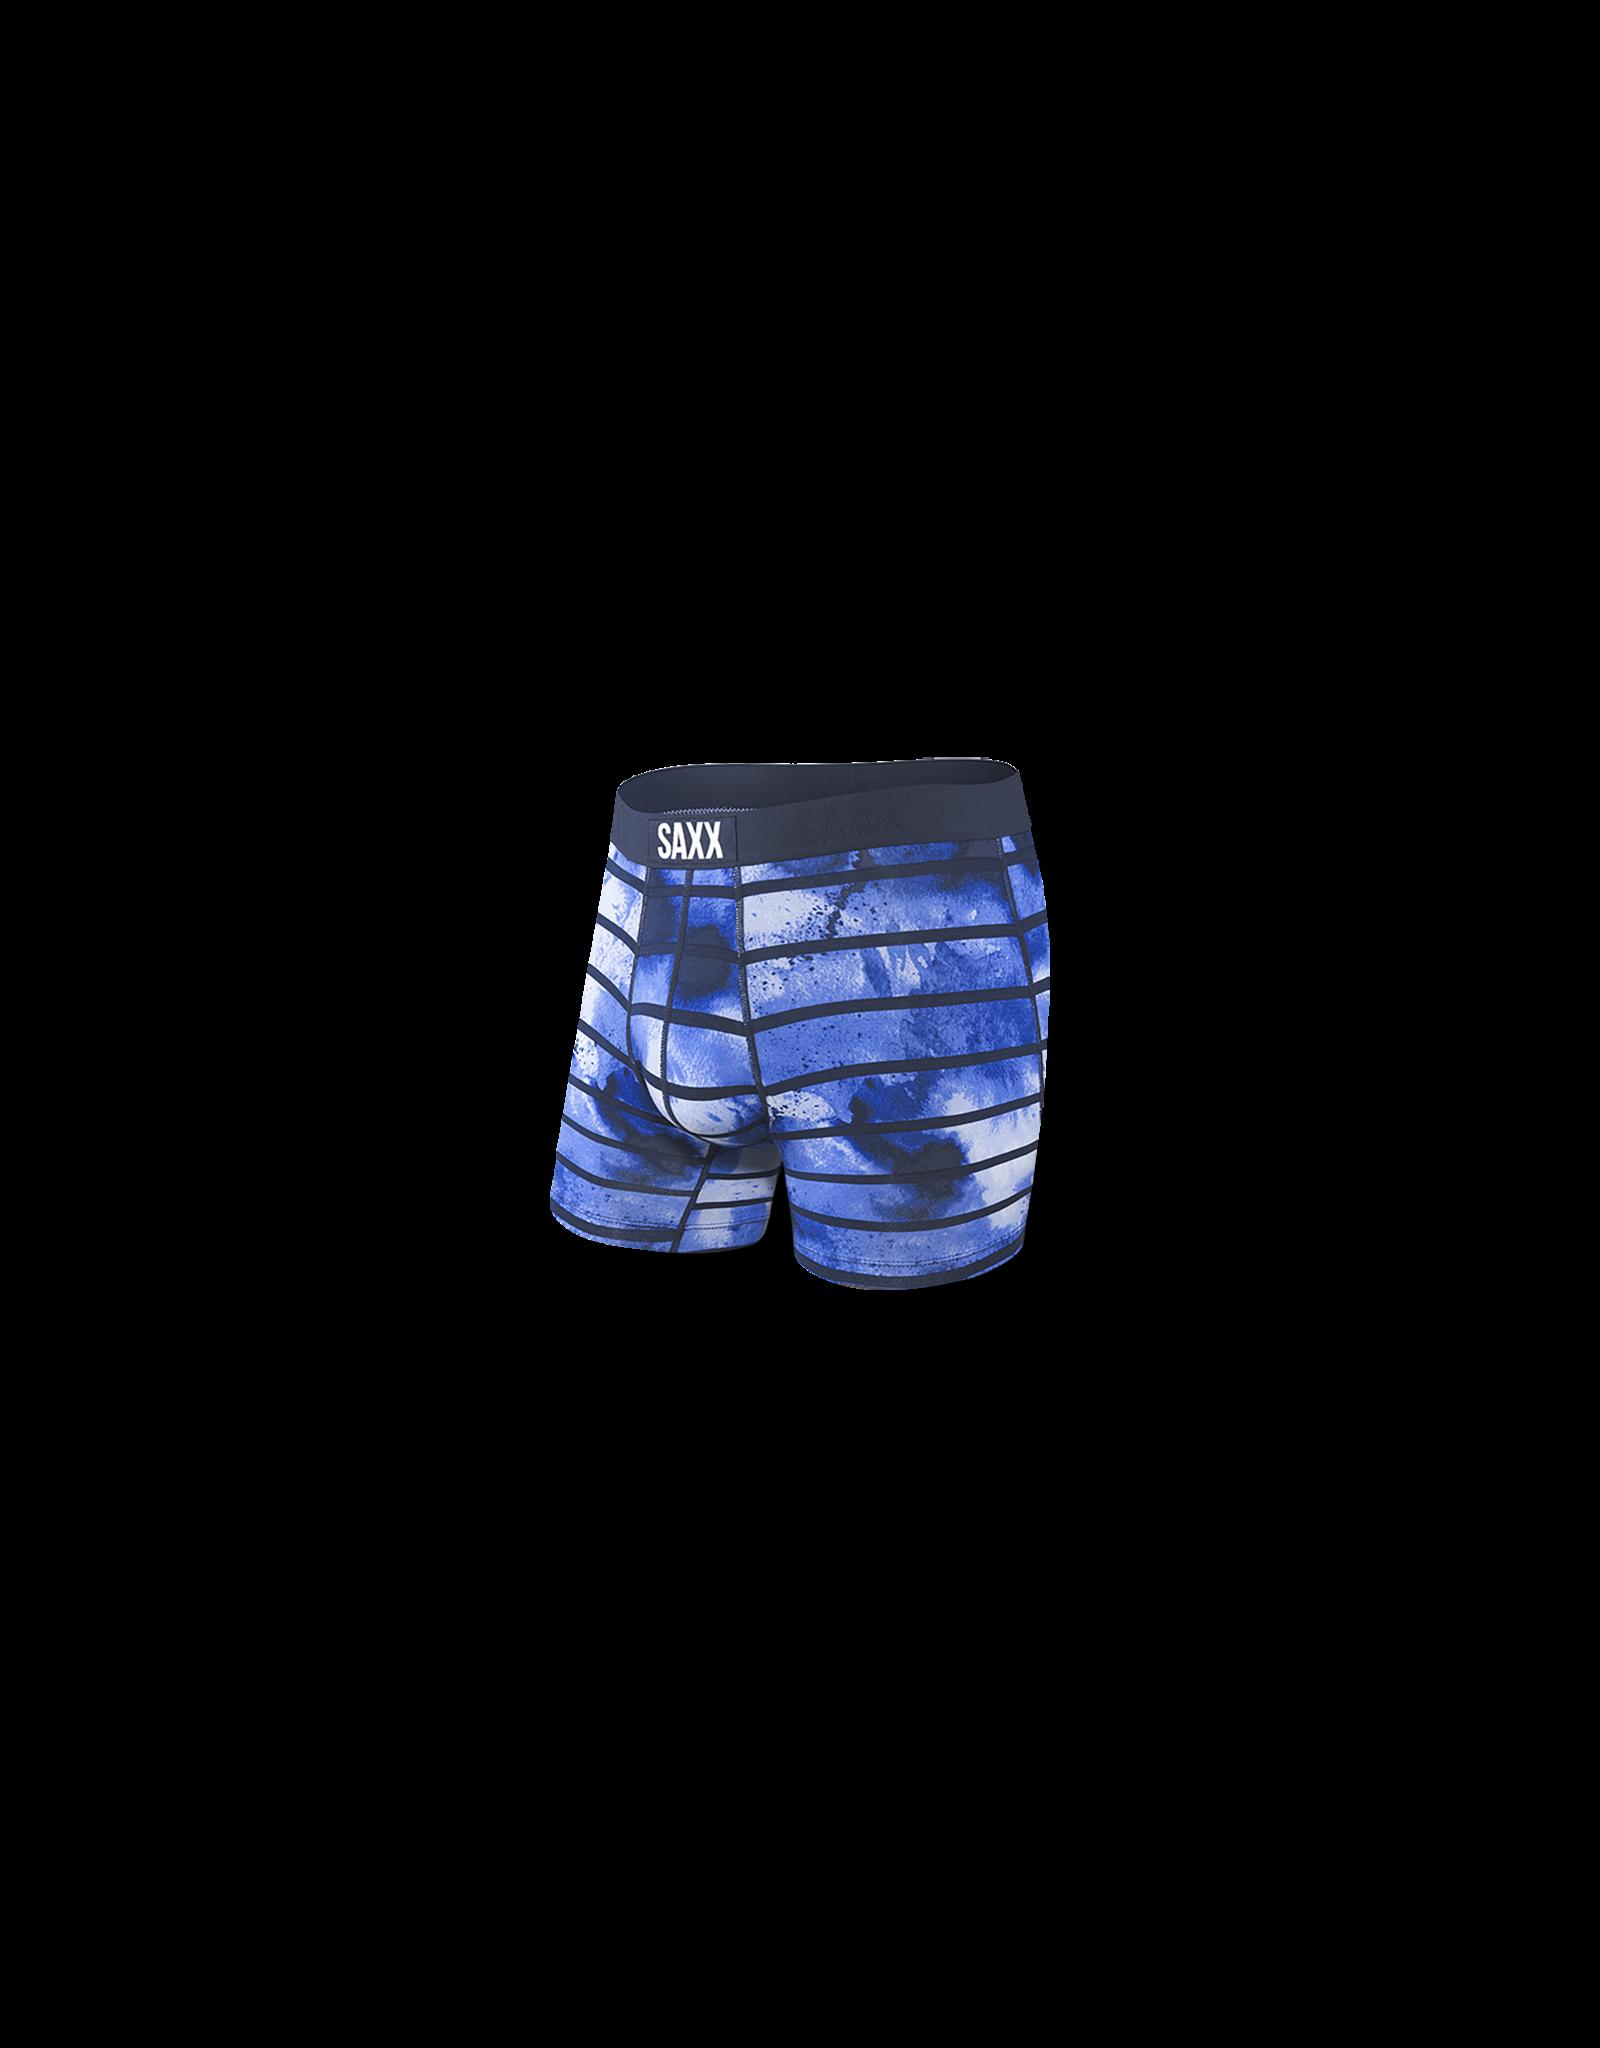 Saxx Saxx Vibe Boxer Brief - Navy Tie Dye Stripe